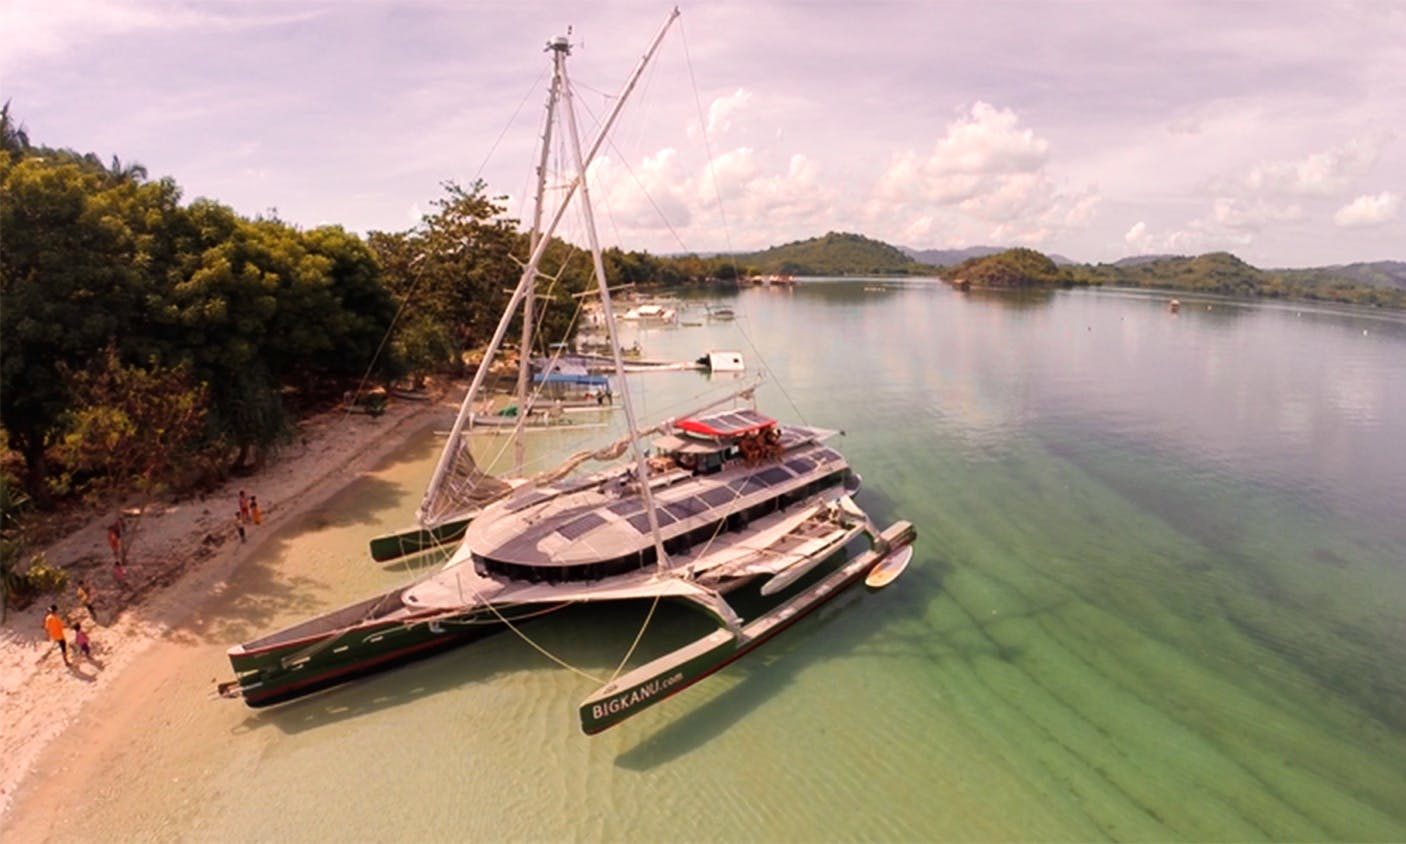 """Big Kanu"" Trimaran Charter in Nusapenida, Bali For 12 People"